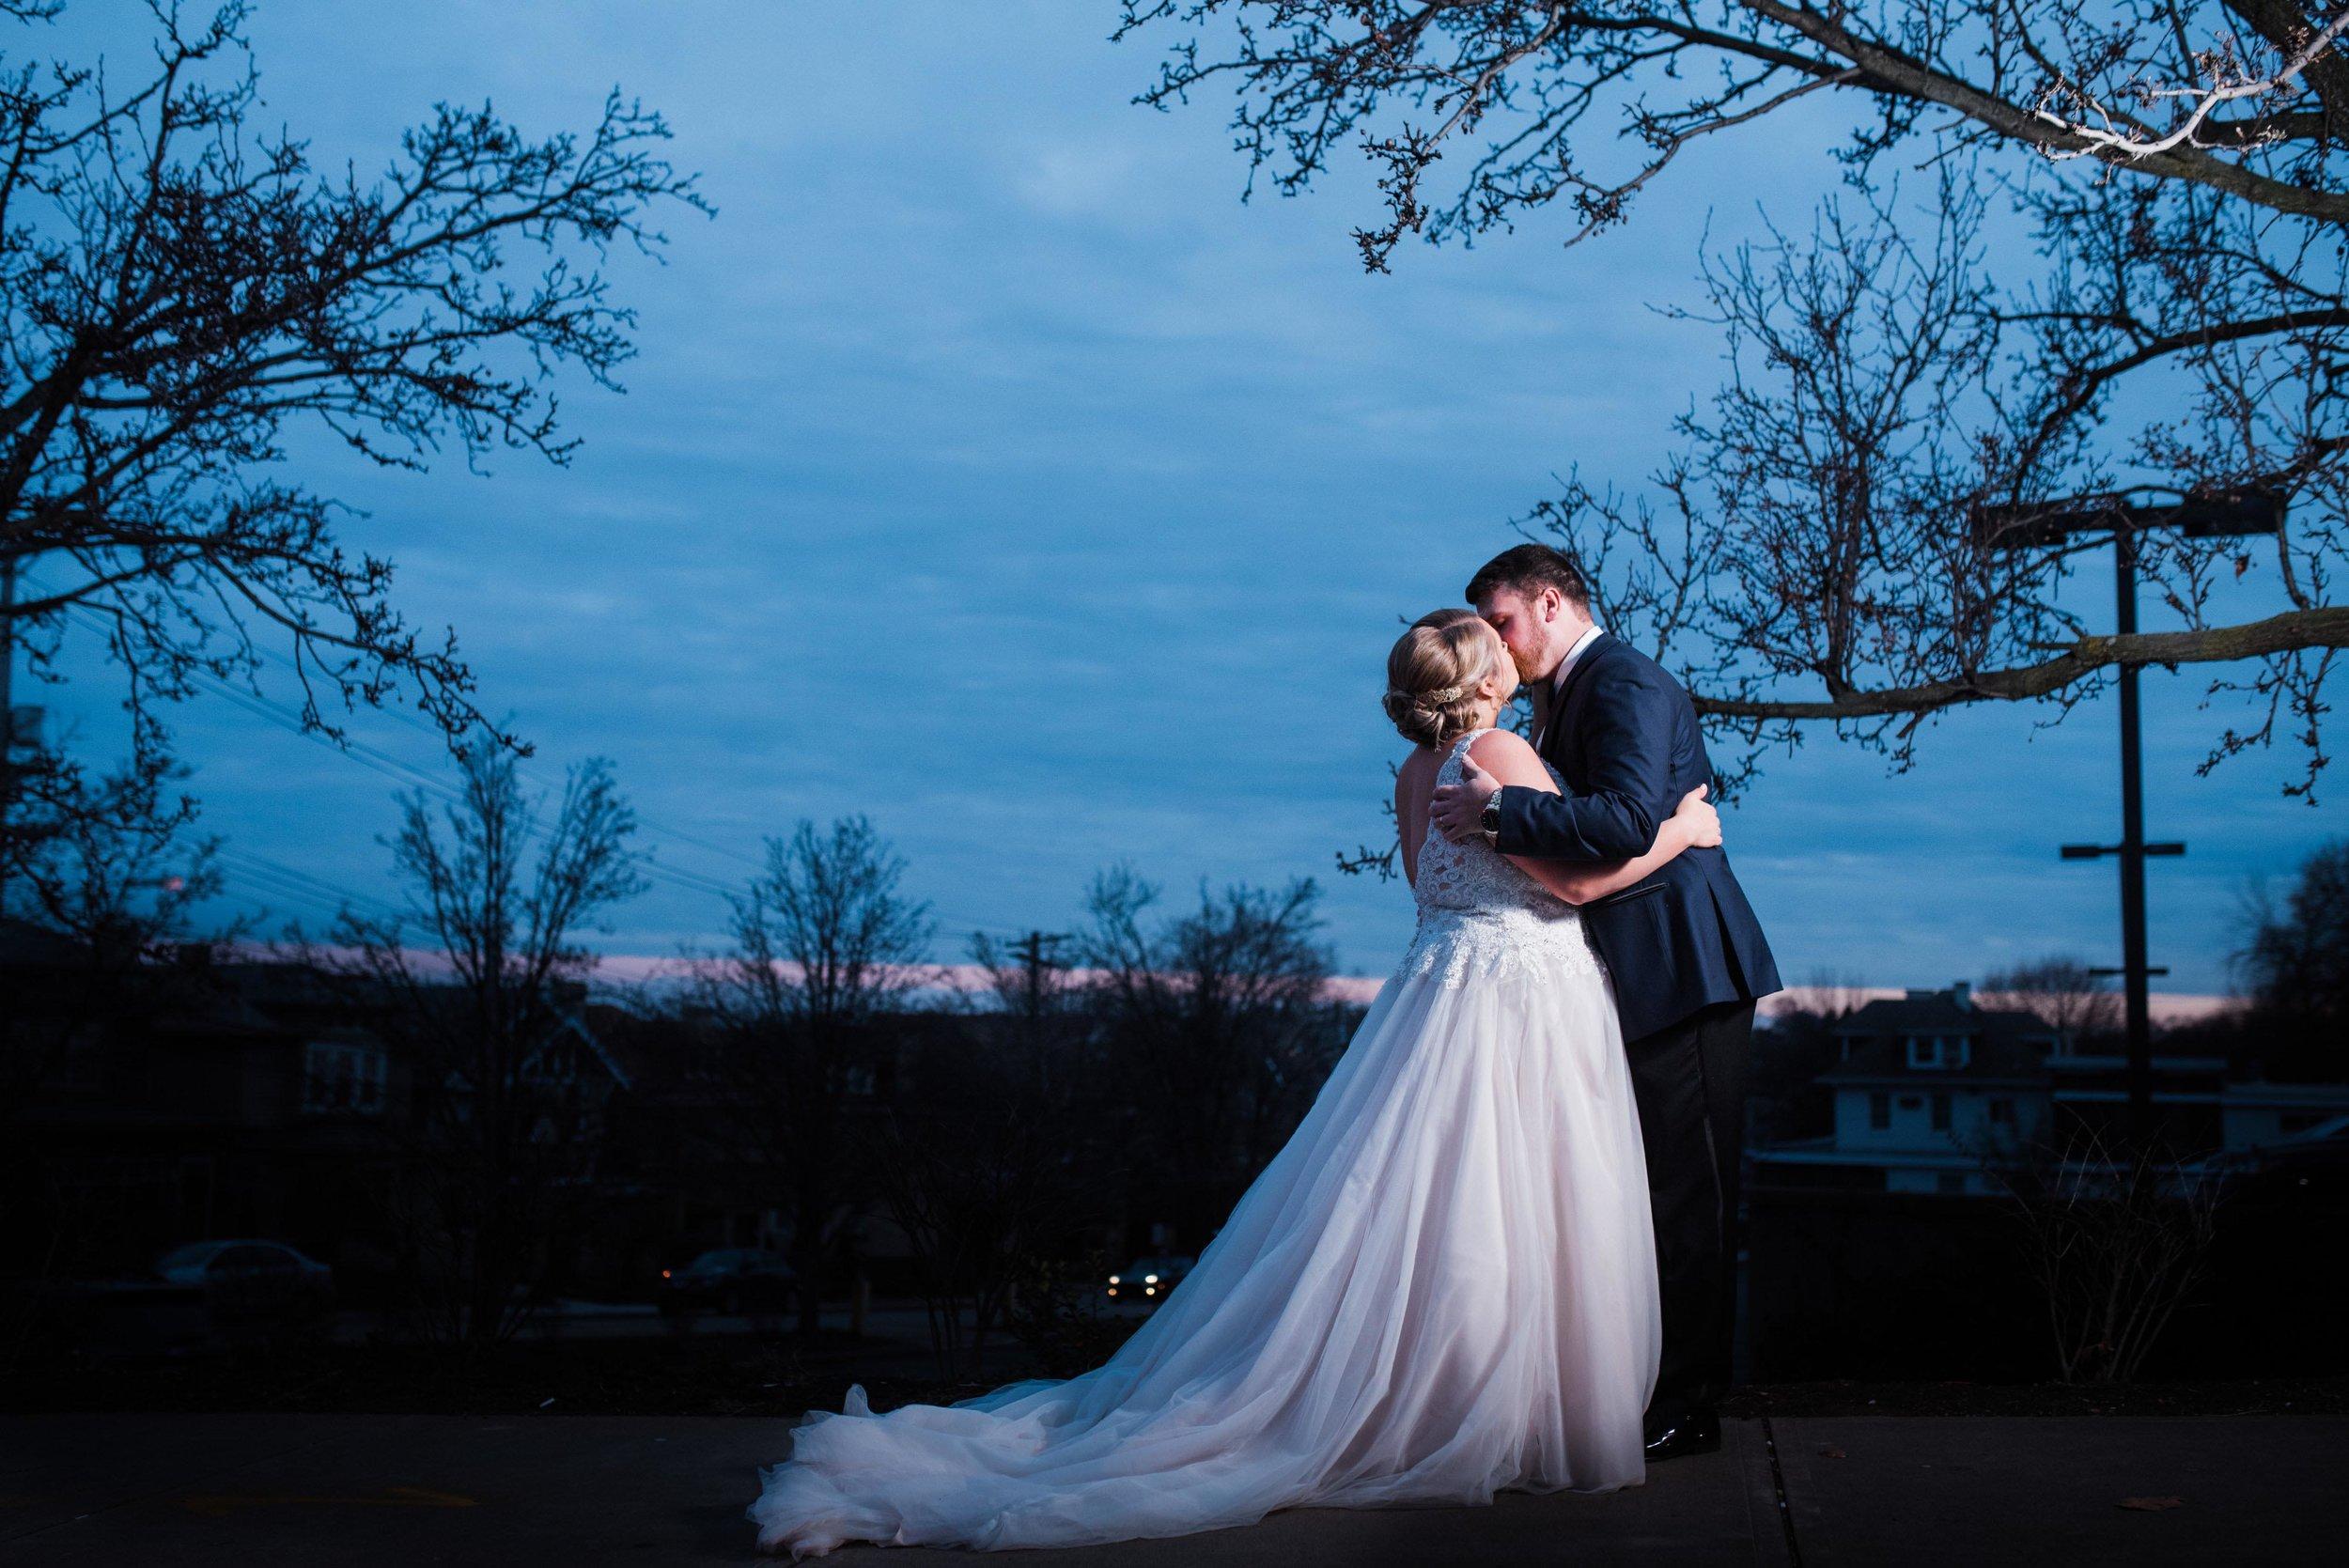 crowne plaza suites pittsburgh wedding, pittsburgh photographers